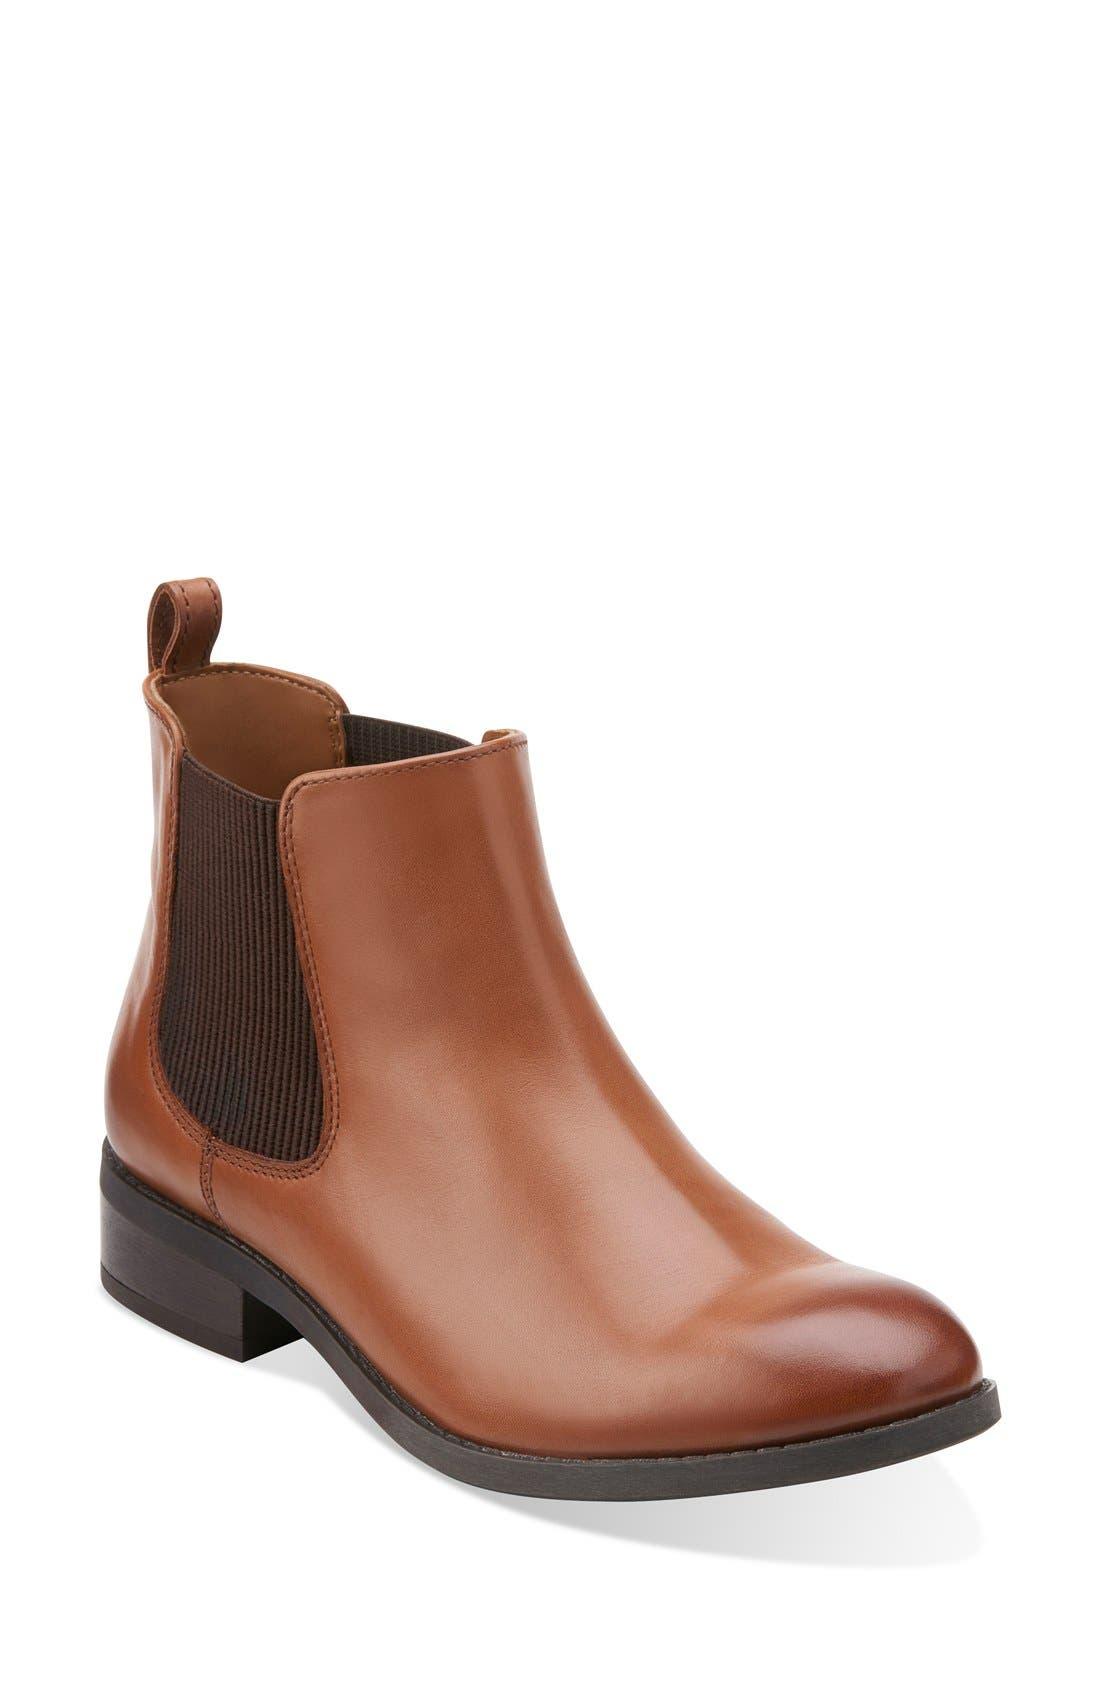 Main Image - Clarks® 'Pita Sedona' Chelsea Boot (Women)